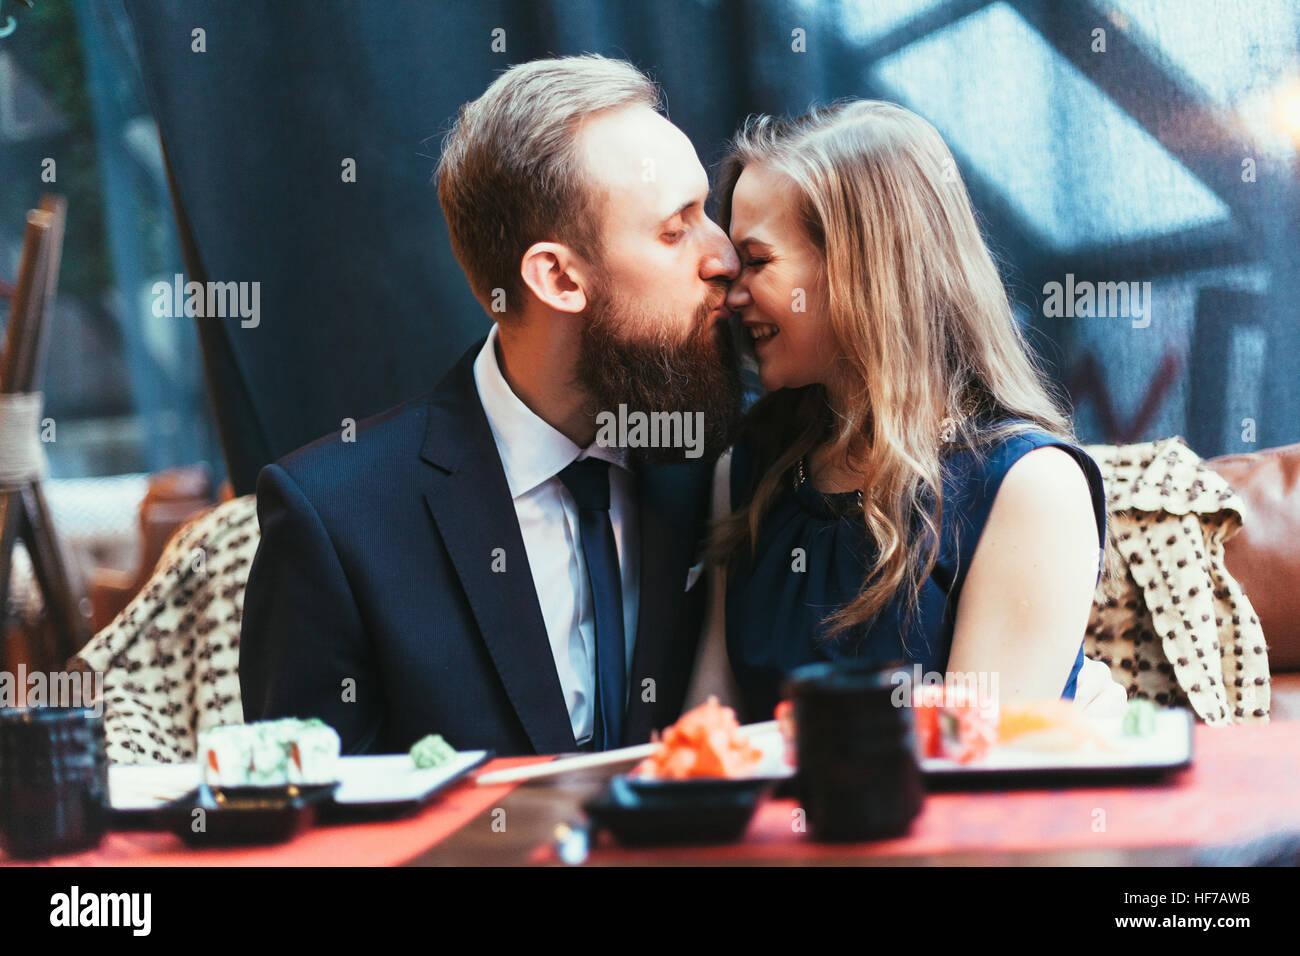 Liebespaar in einem restaurant Stockbild